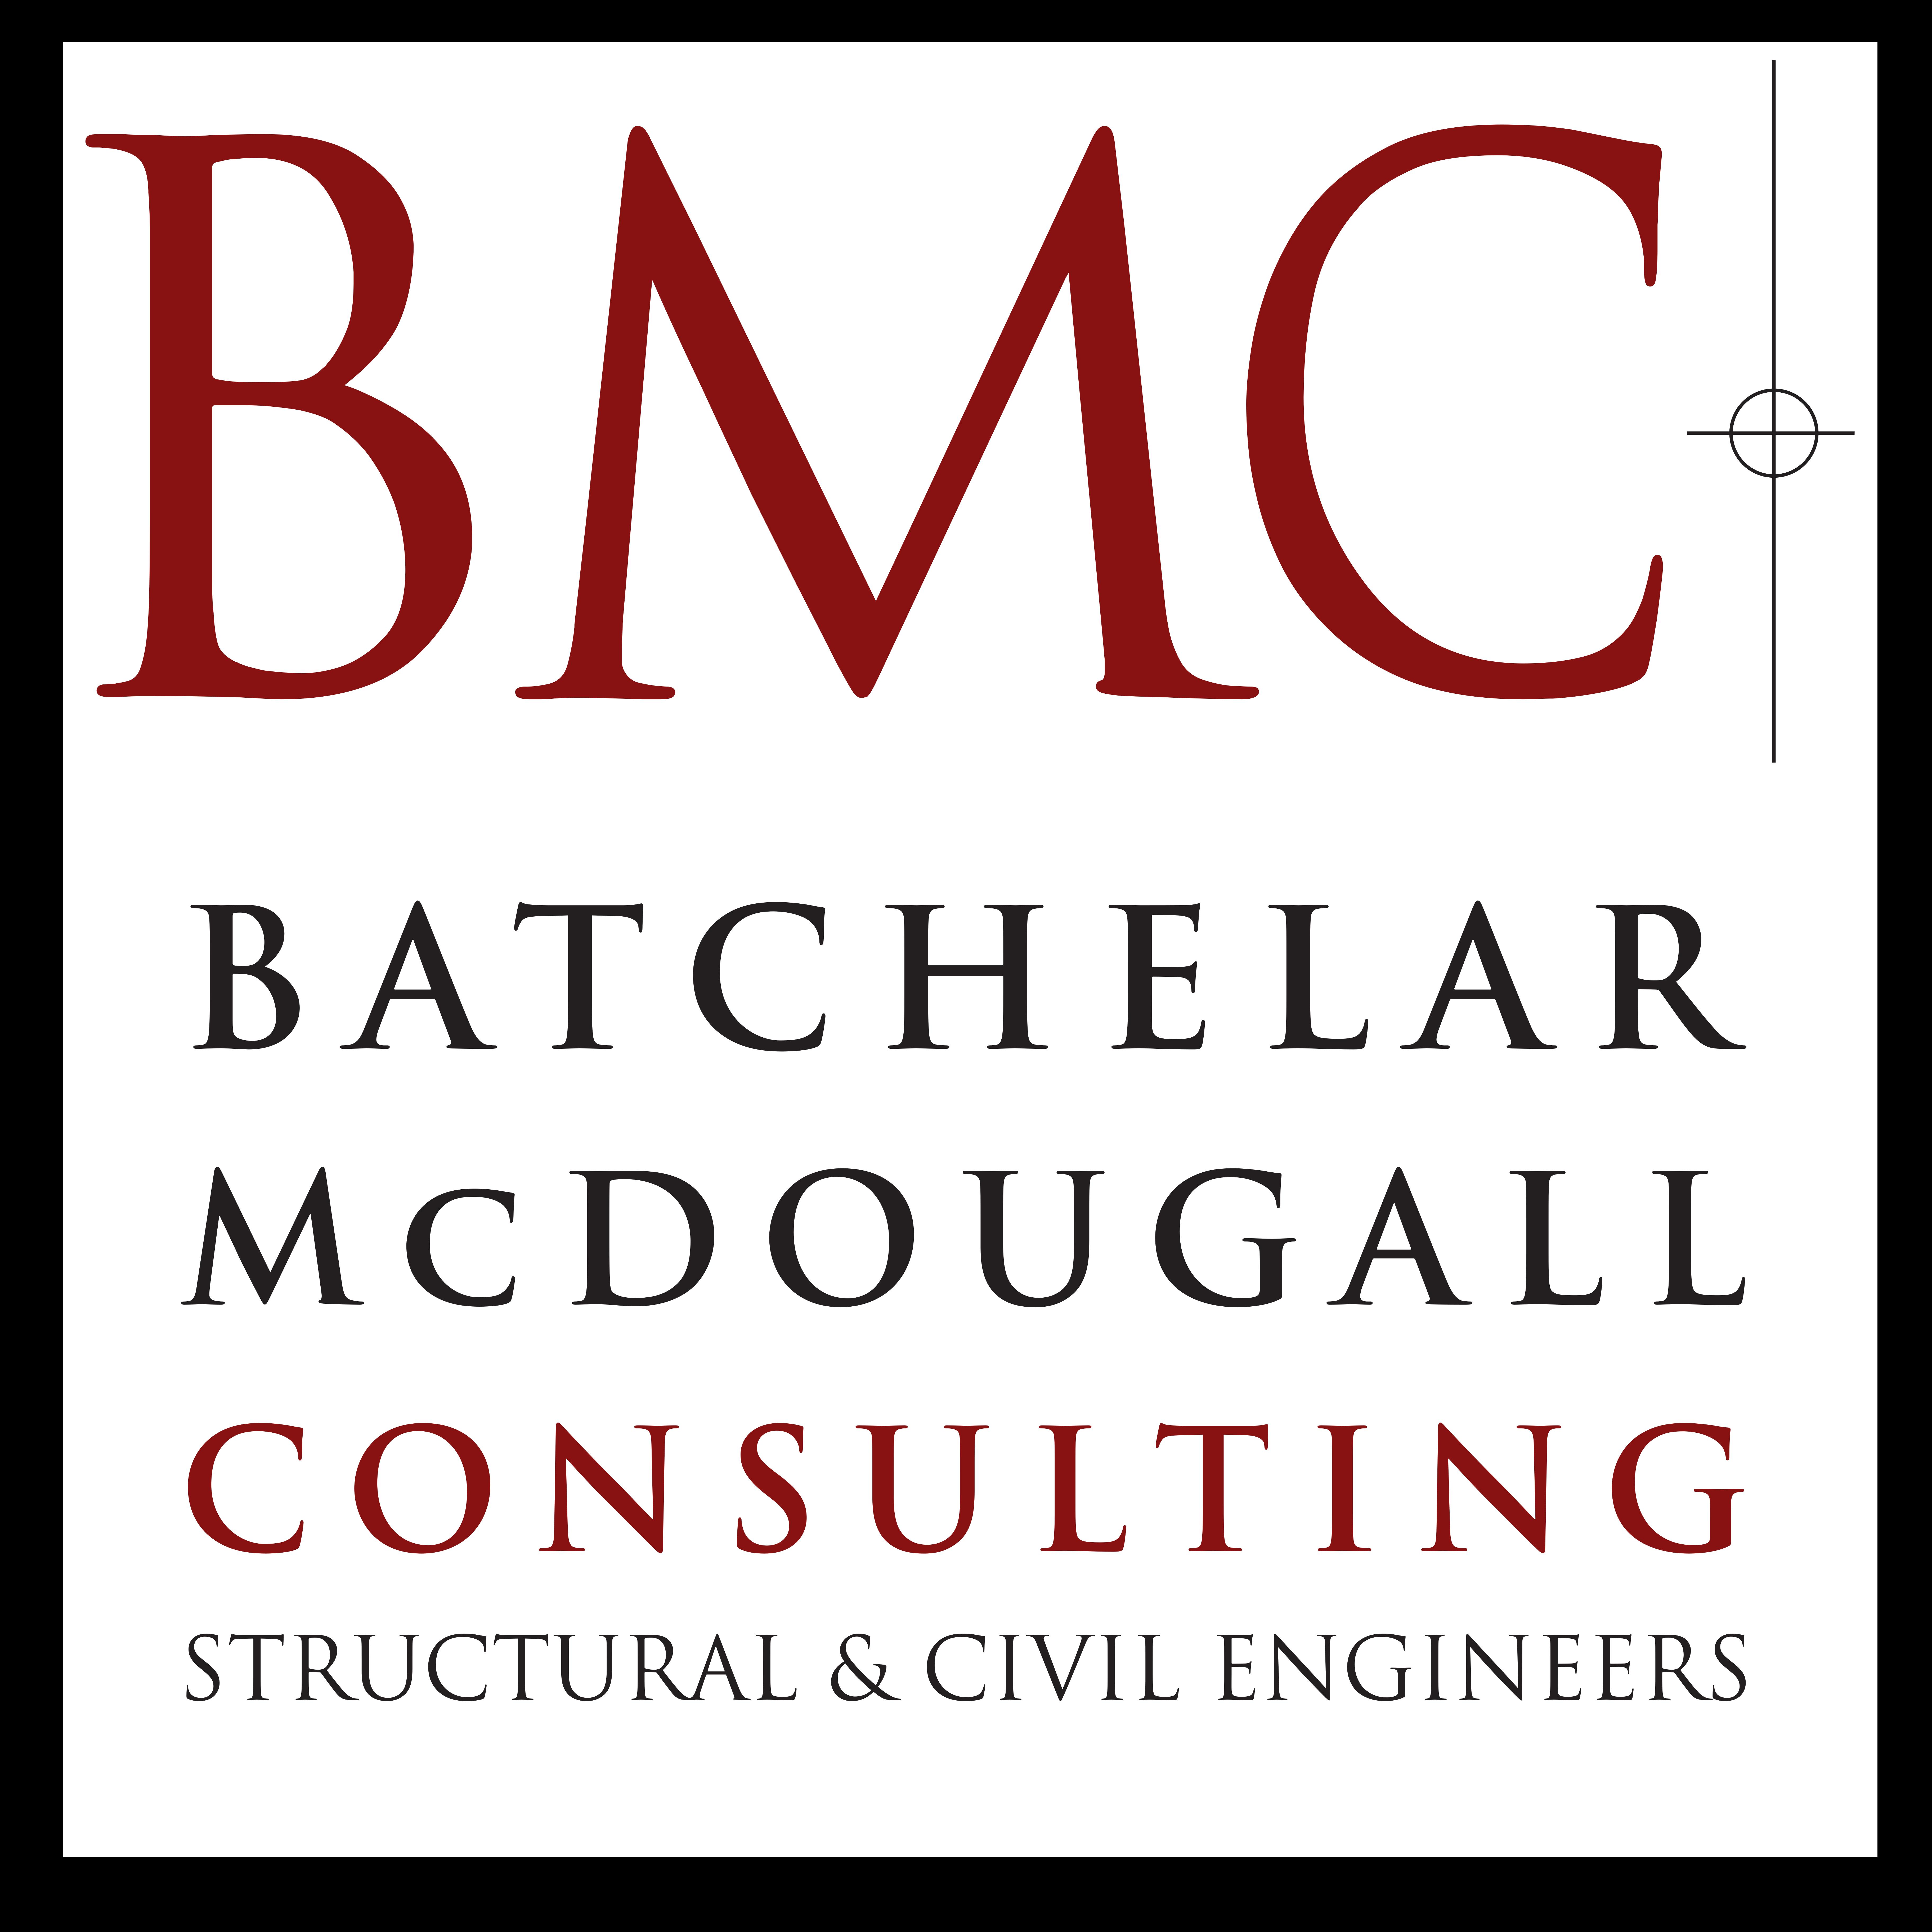 BATCHELAR MCDOUGALL CONSULTING LTD